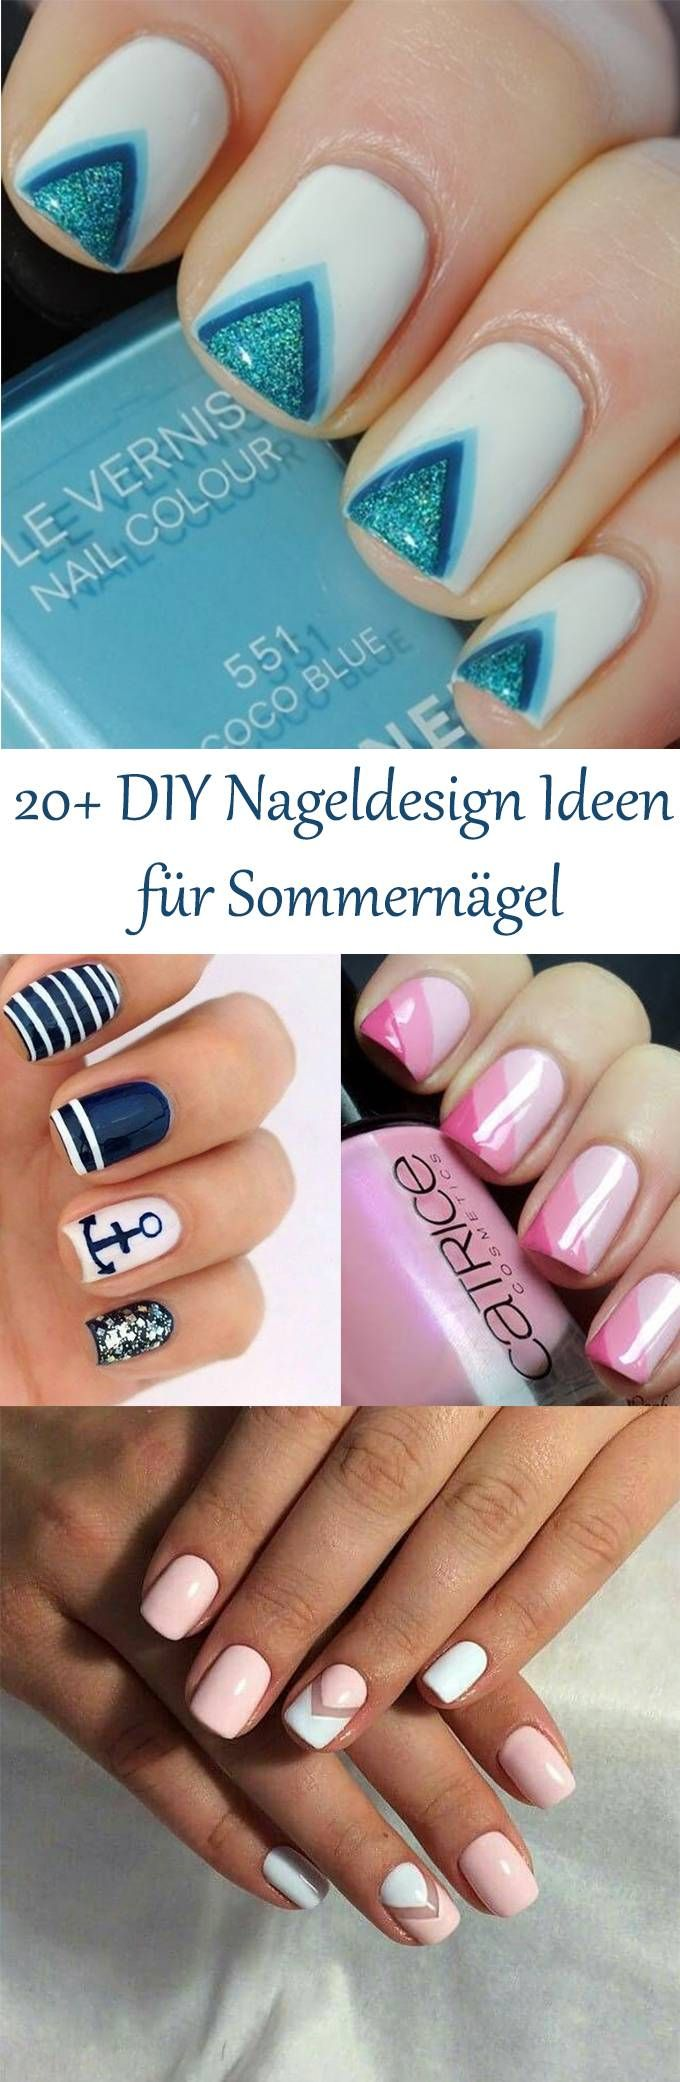 20+ DIY Nail Design Ideen für verträumte Sommernägel – Der Sommer kann kommen – nailart